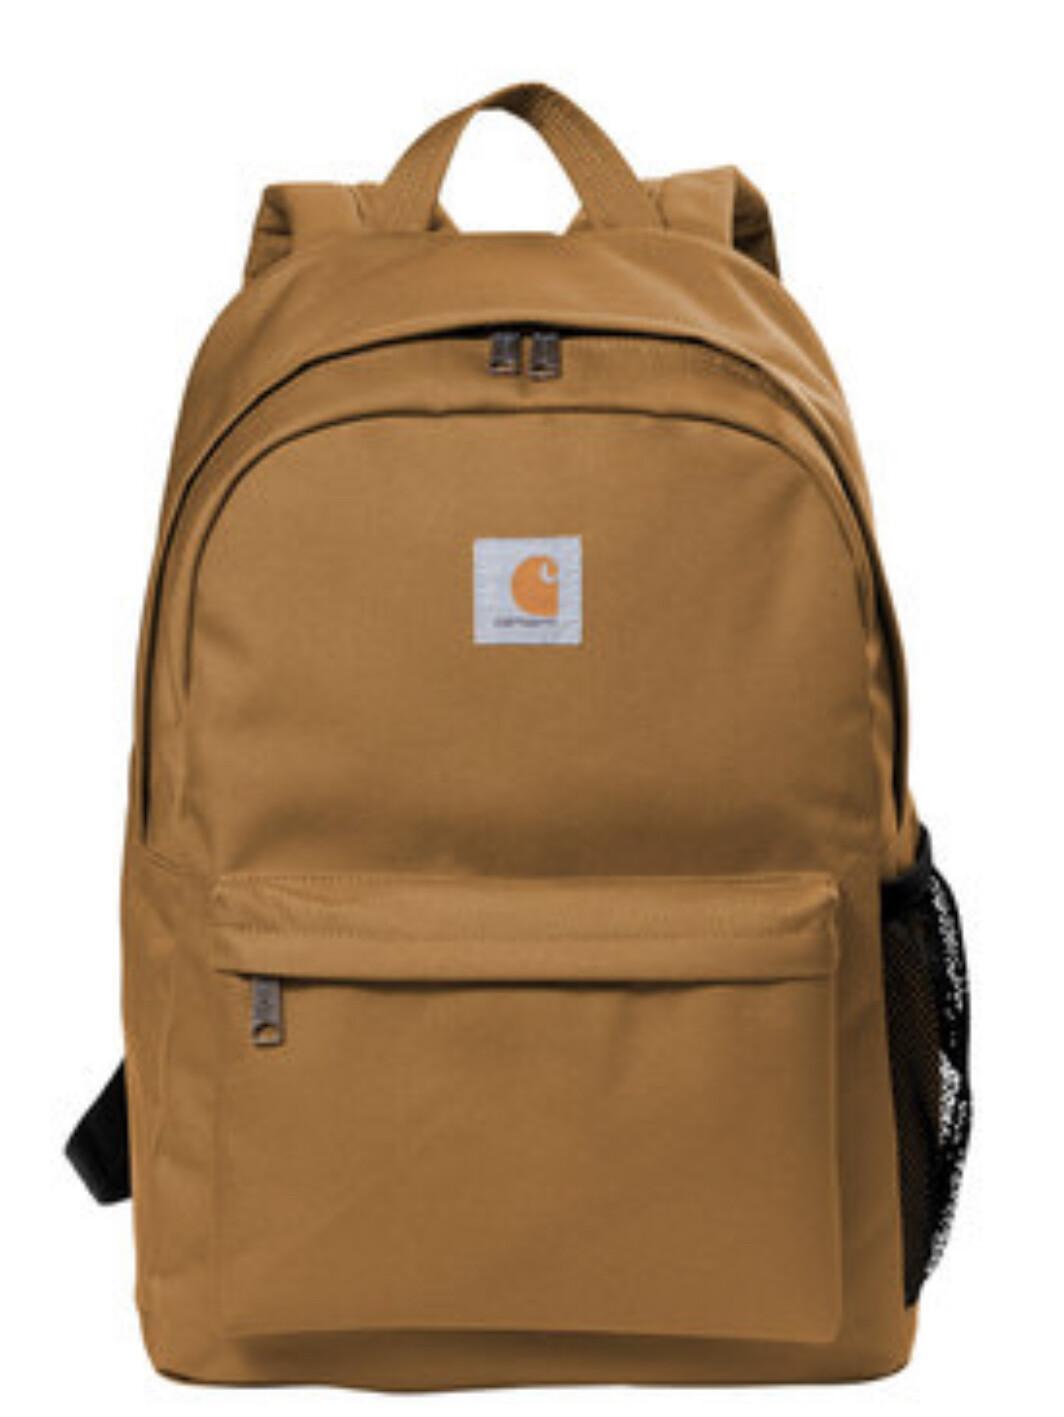 Carhartt Canvas Backpack